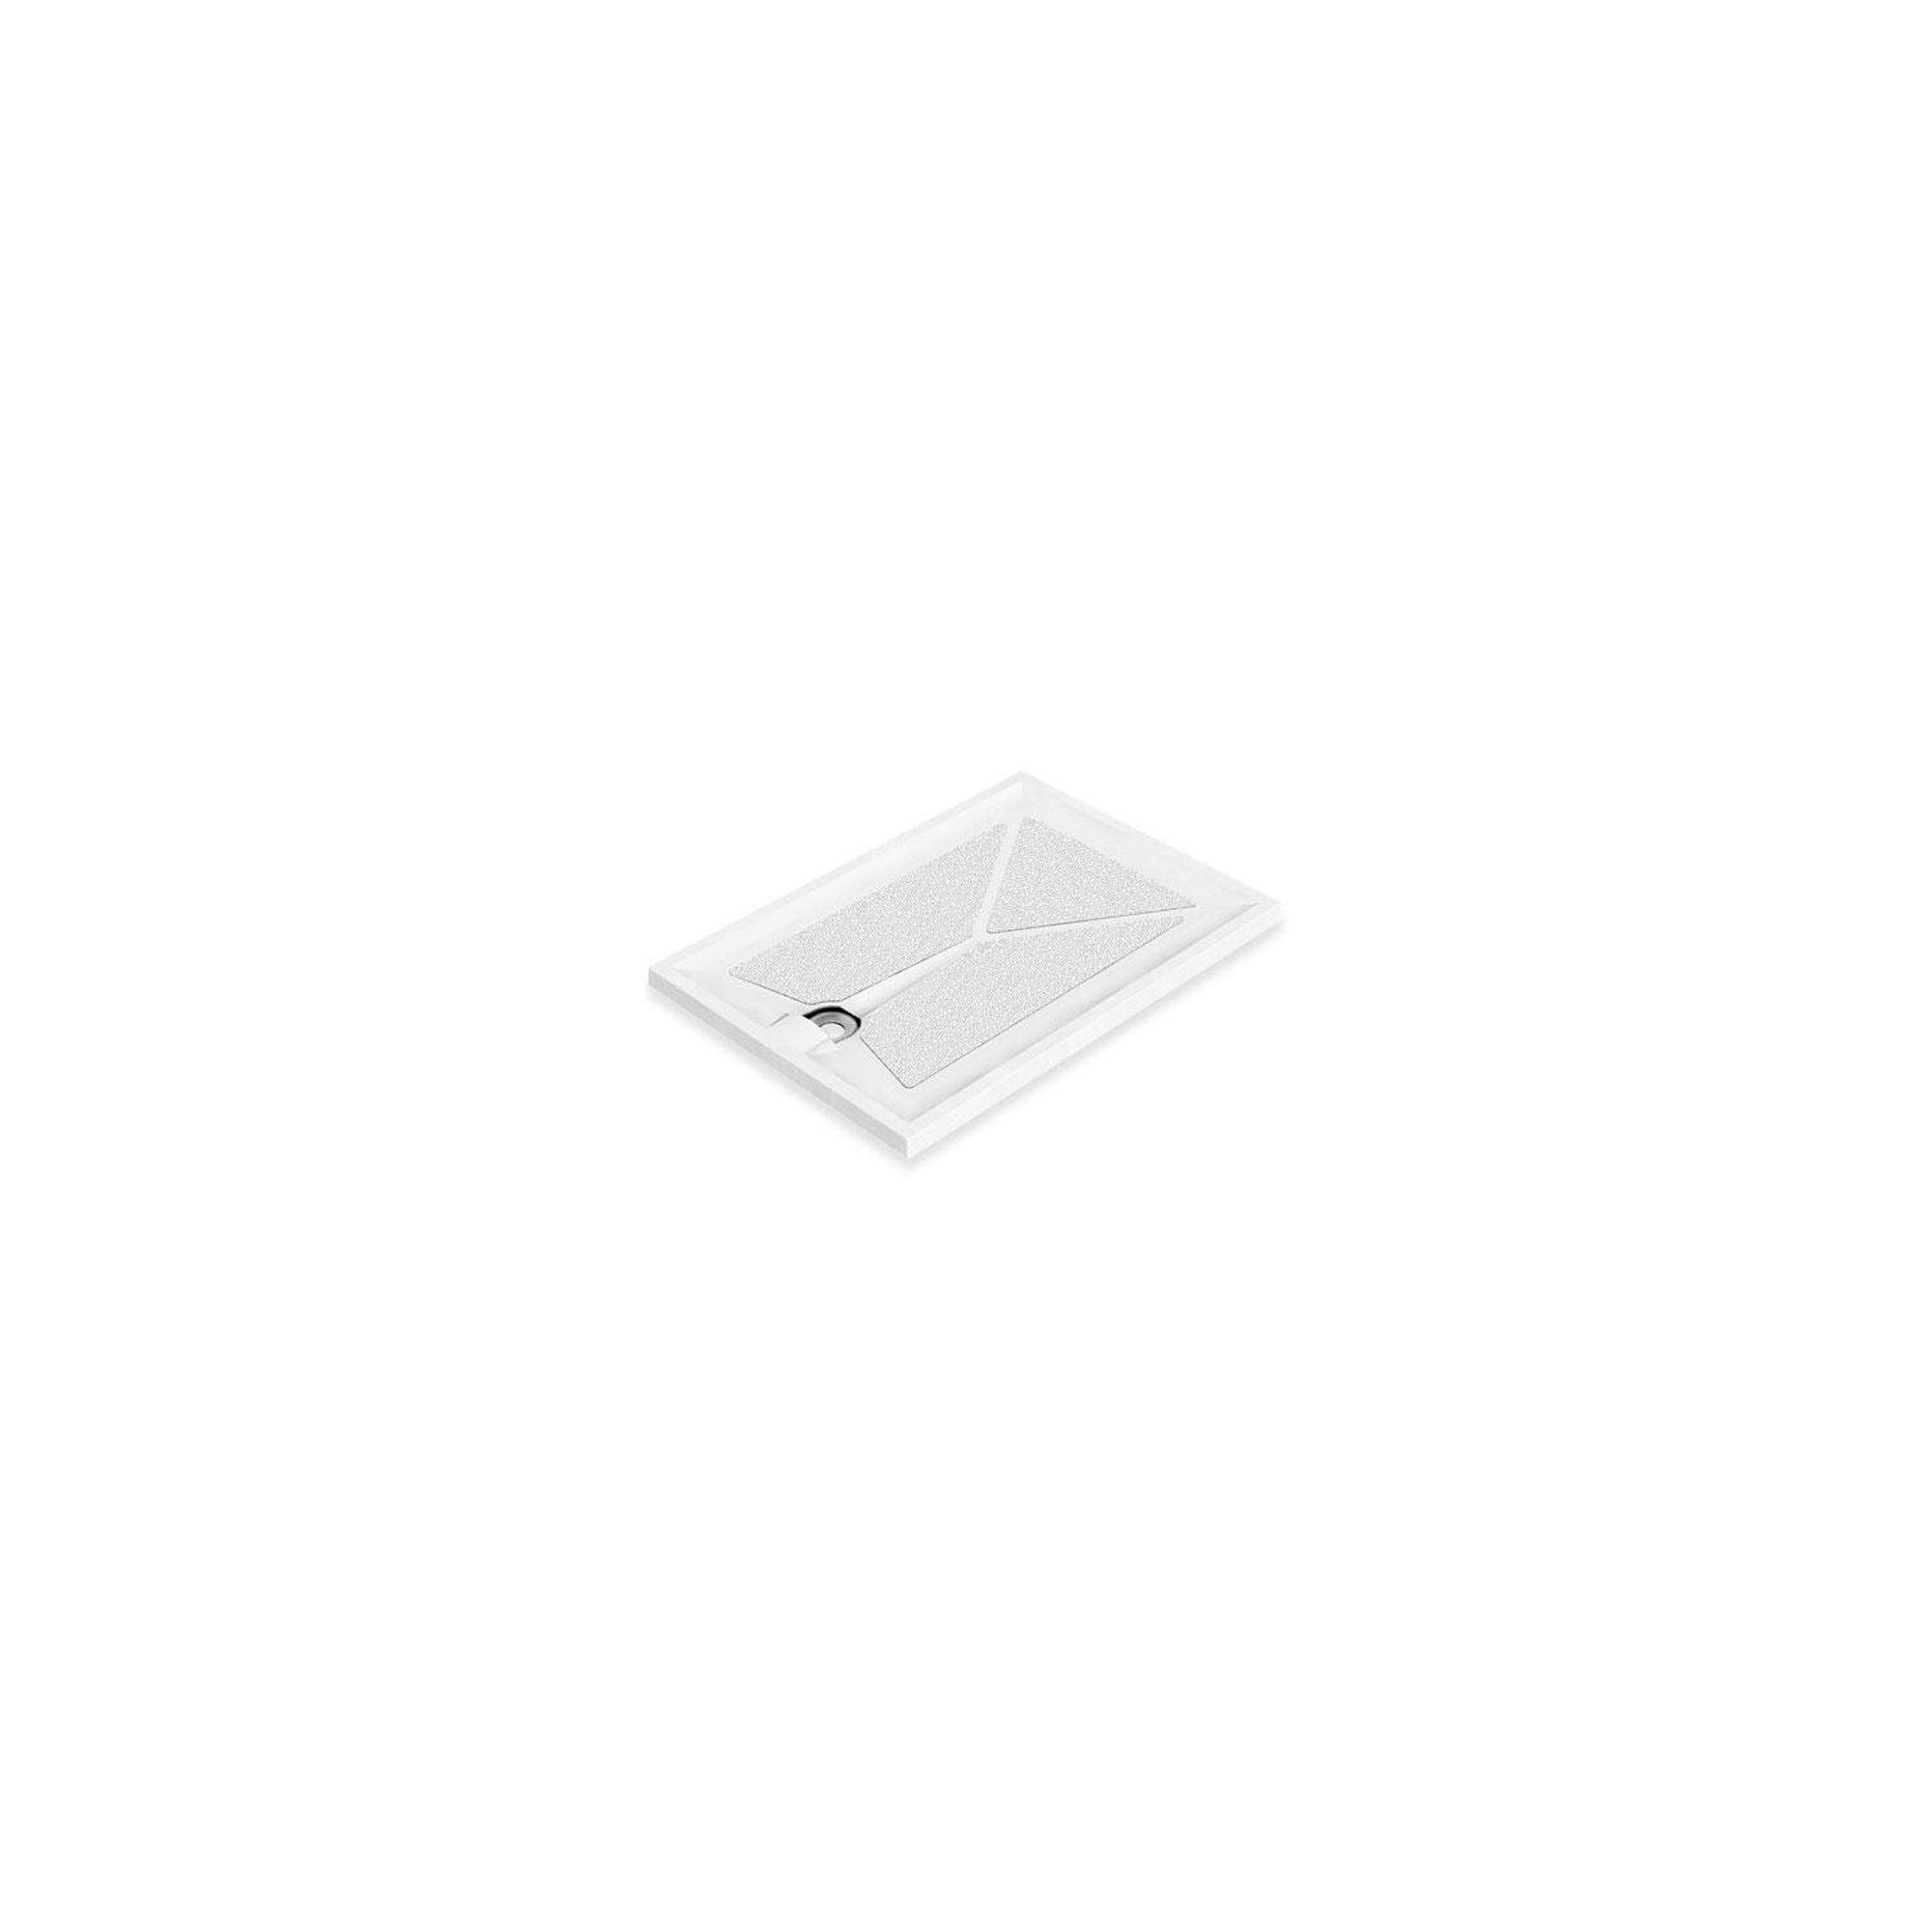 AKW Braddan Rectangular Shower Tray 1200mm x 650mm at Tesco Direct